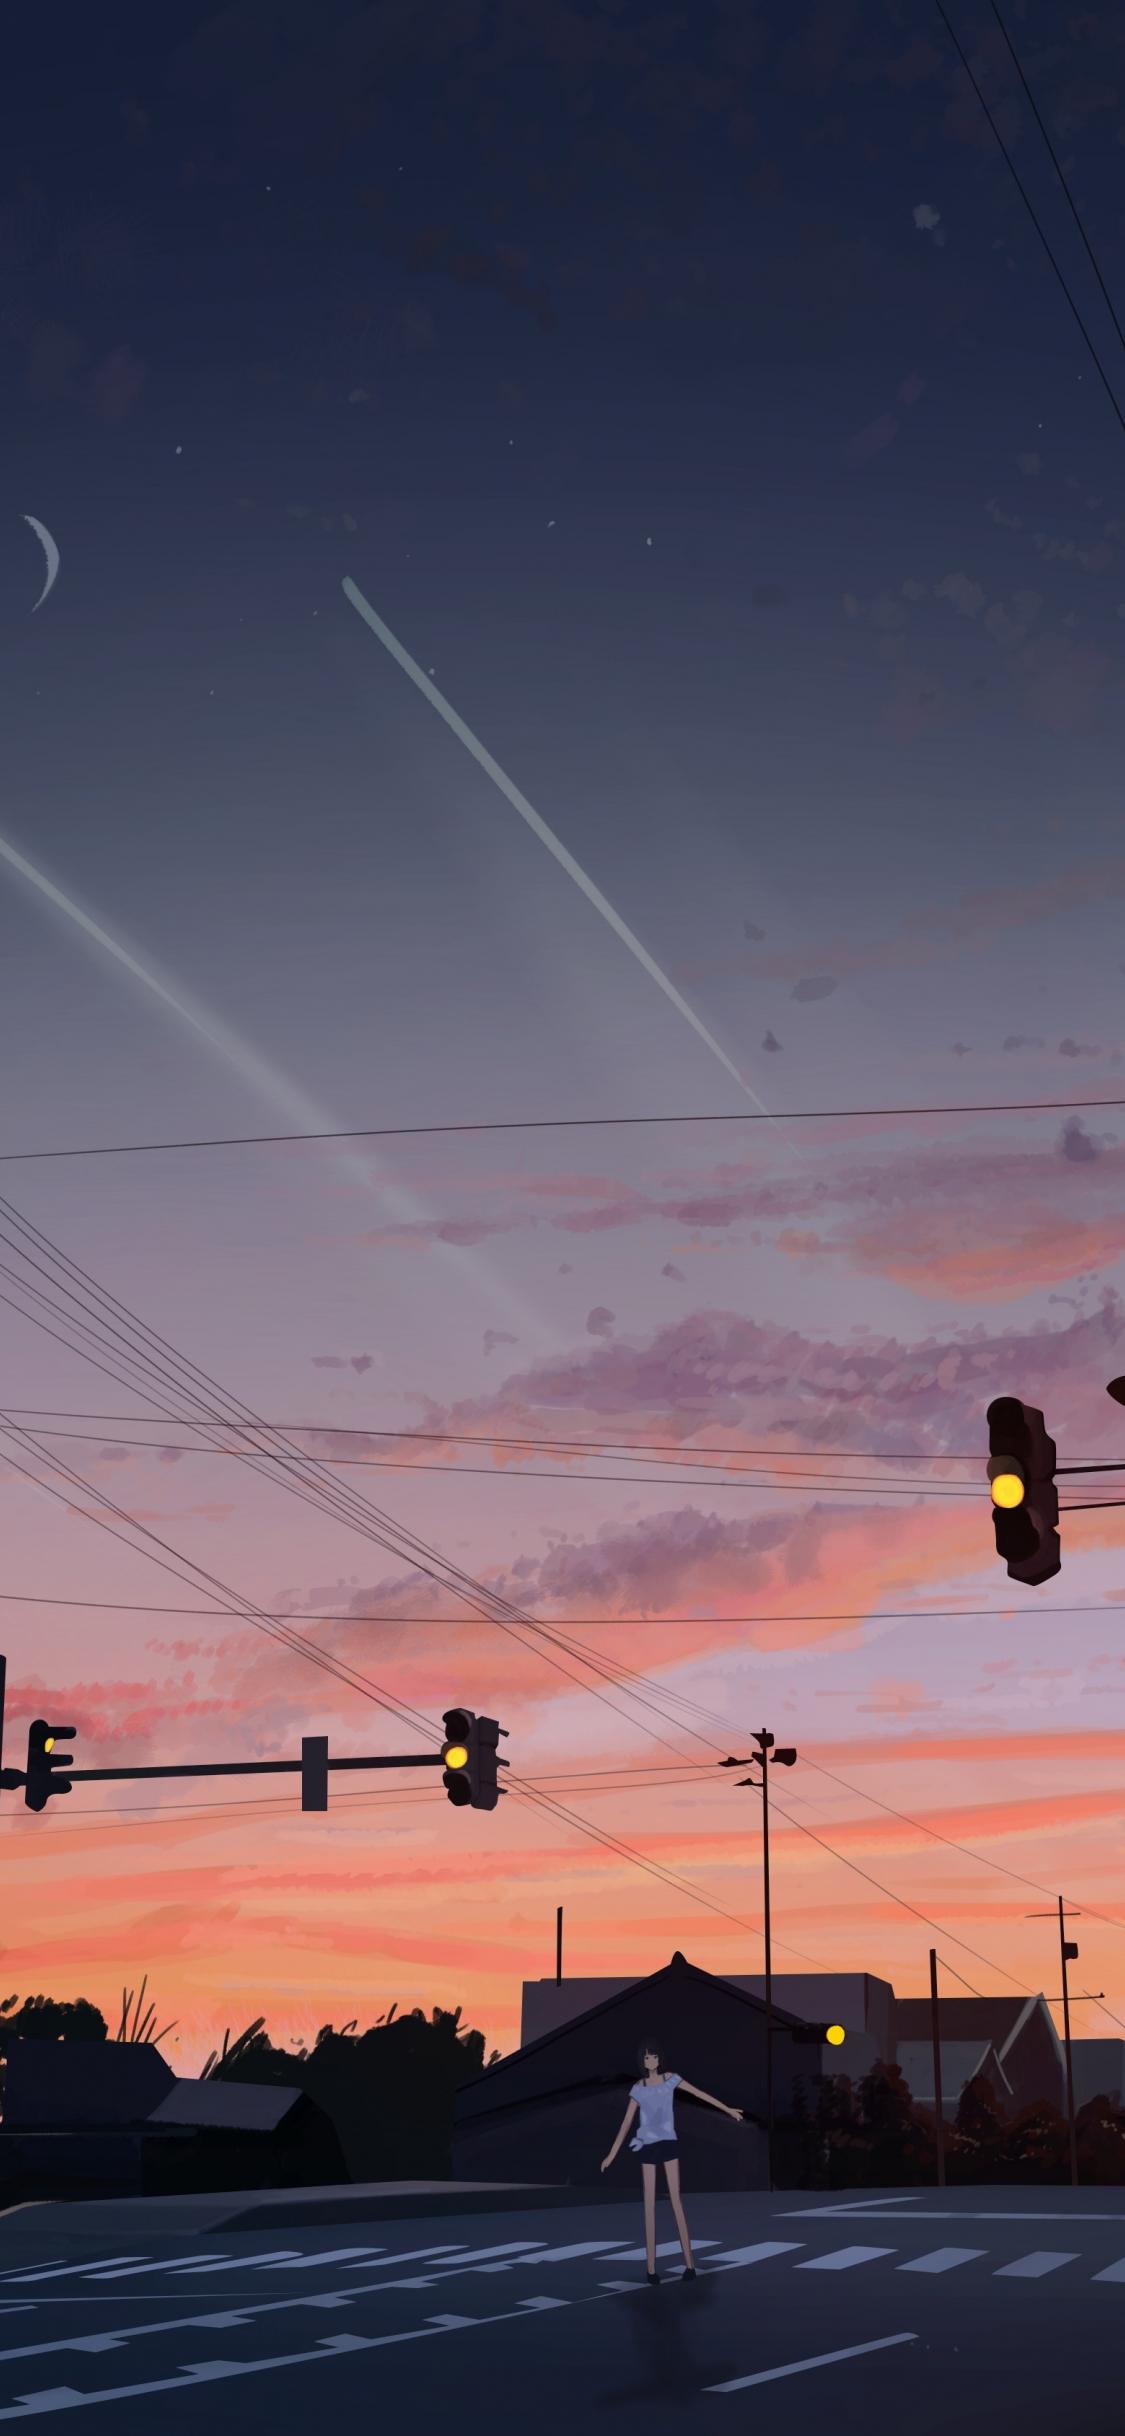 Download 1125x2436 Wallpaper Sunset Street Original Anime